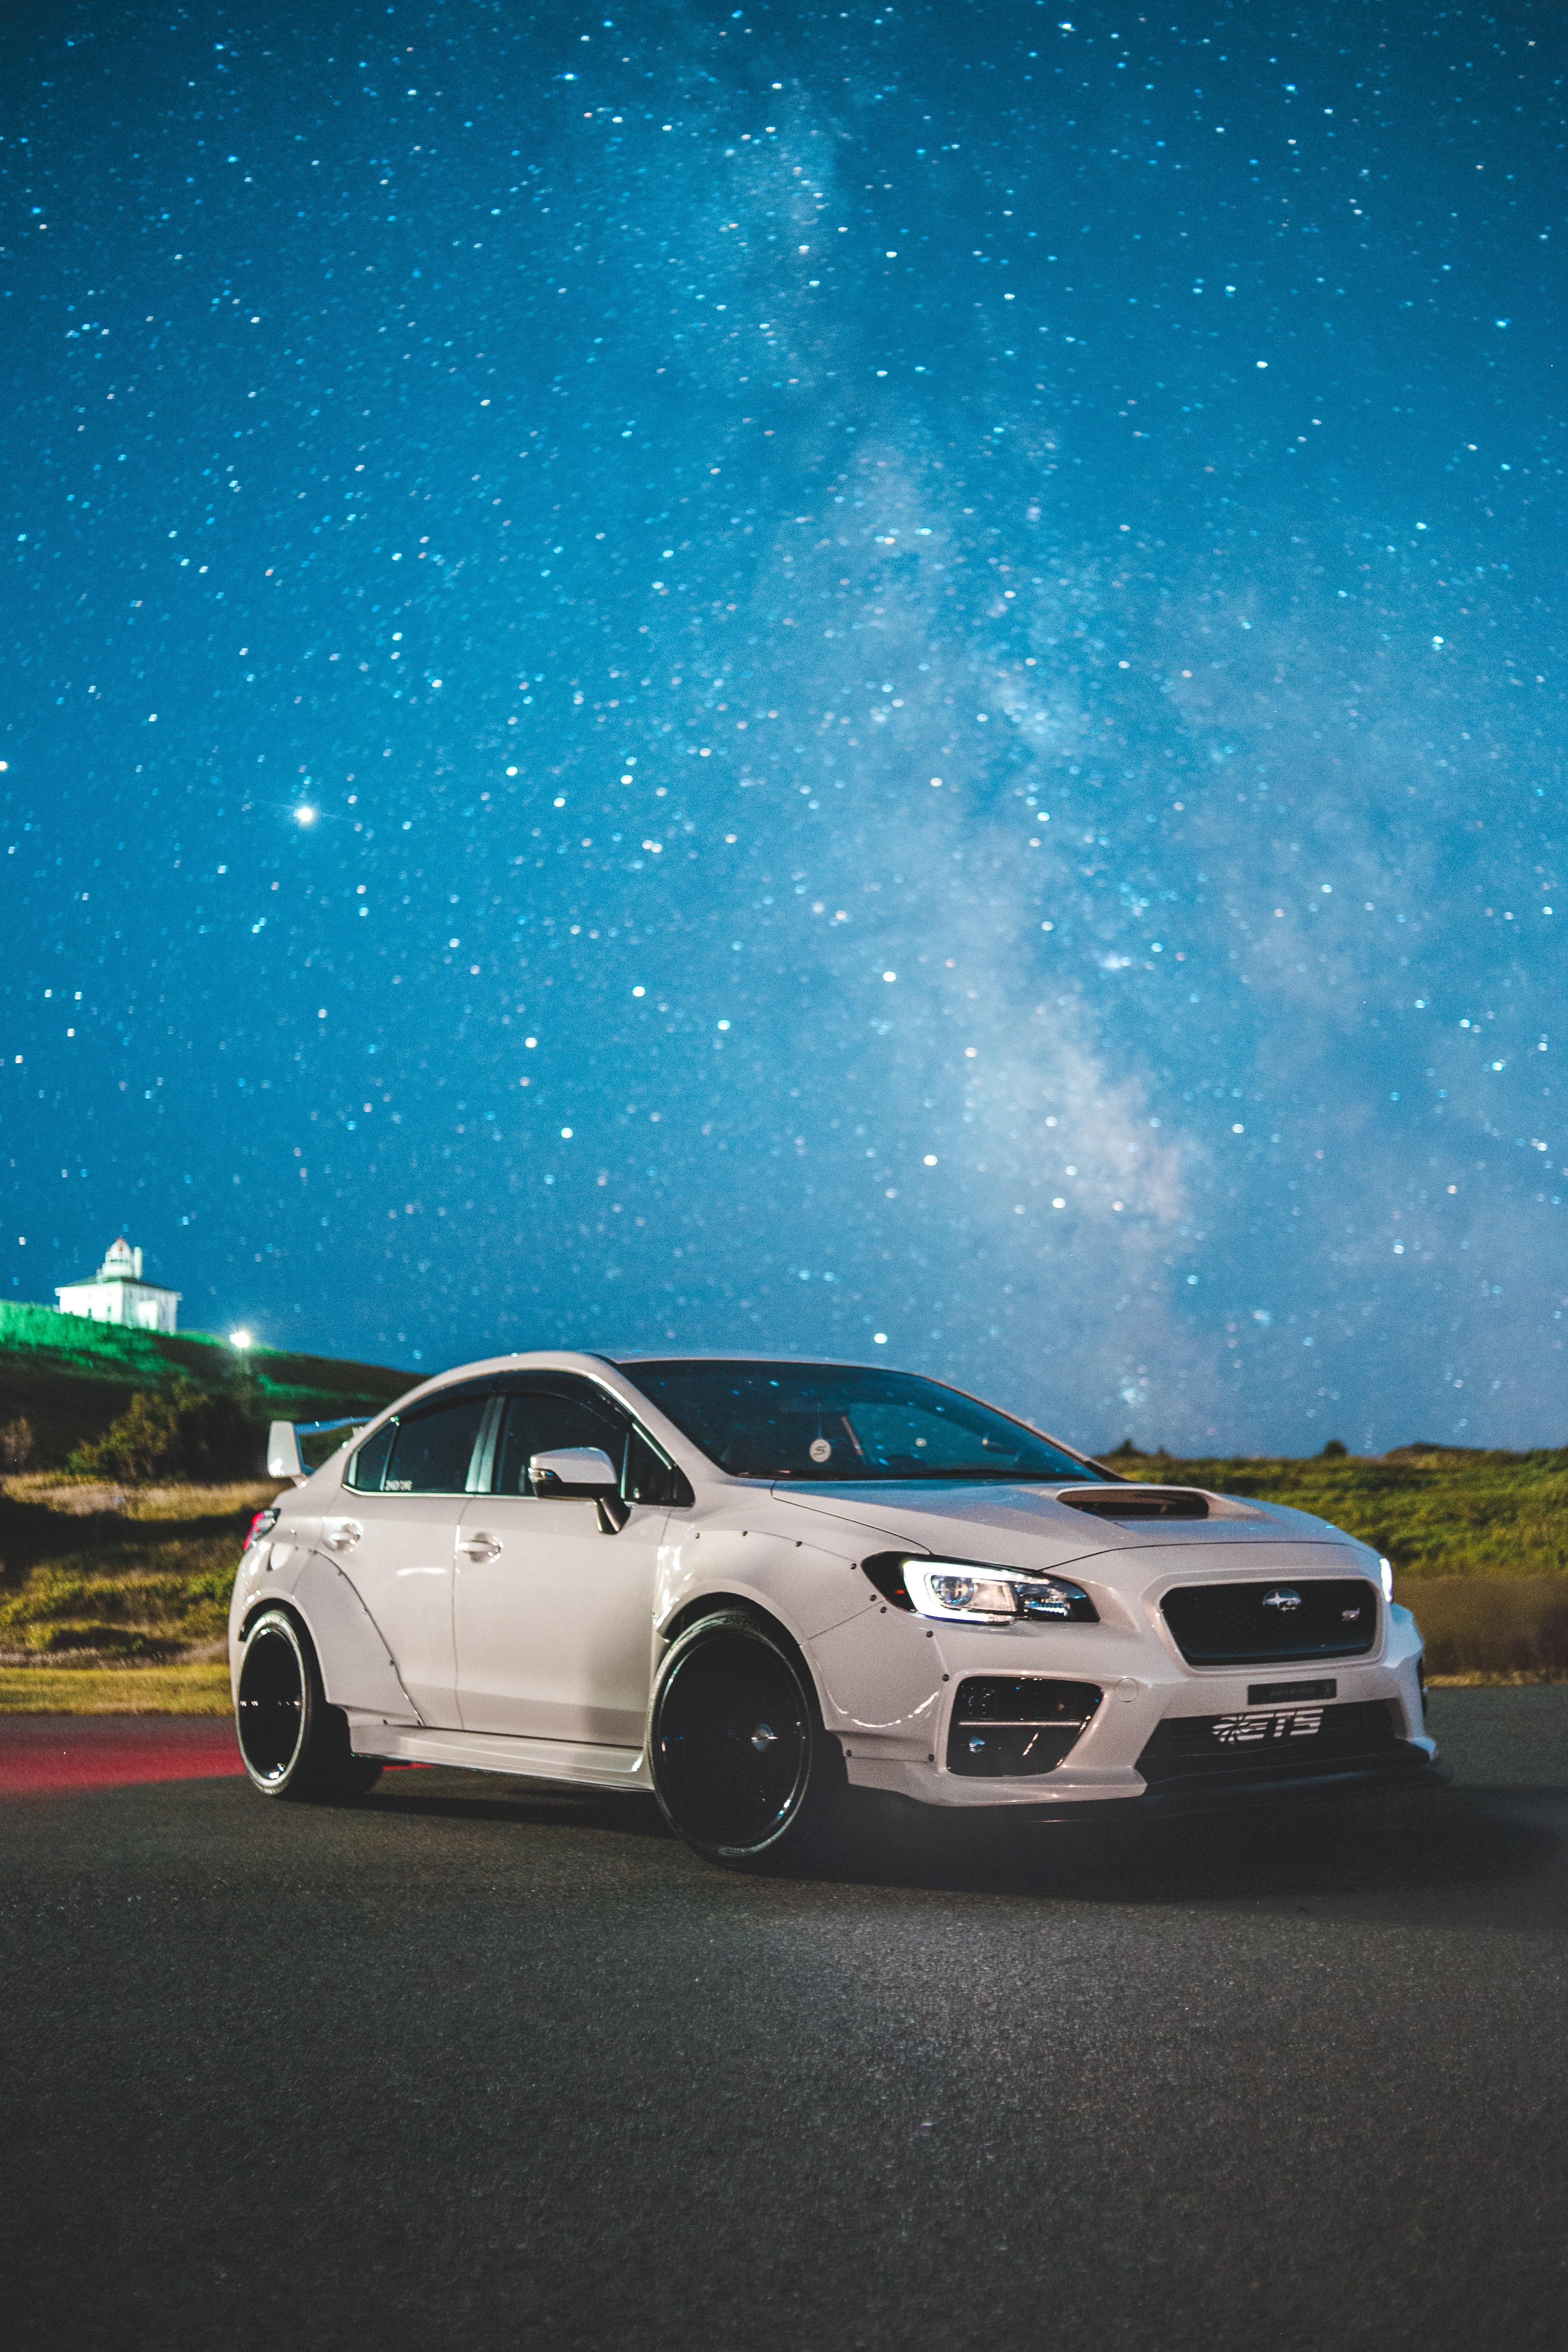 62994 Screensavers and Wallpapers Subaru for phone. Download Subaru, Cars, Car, Side View, Spoiler pictures for free